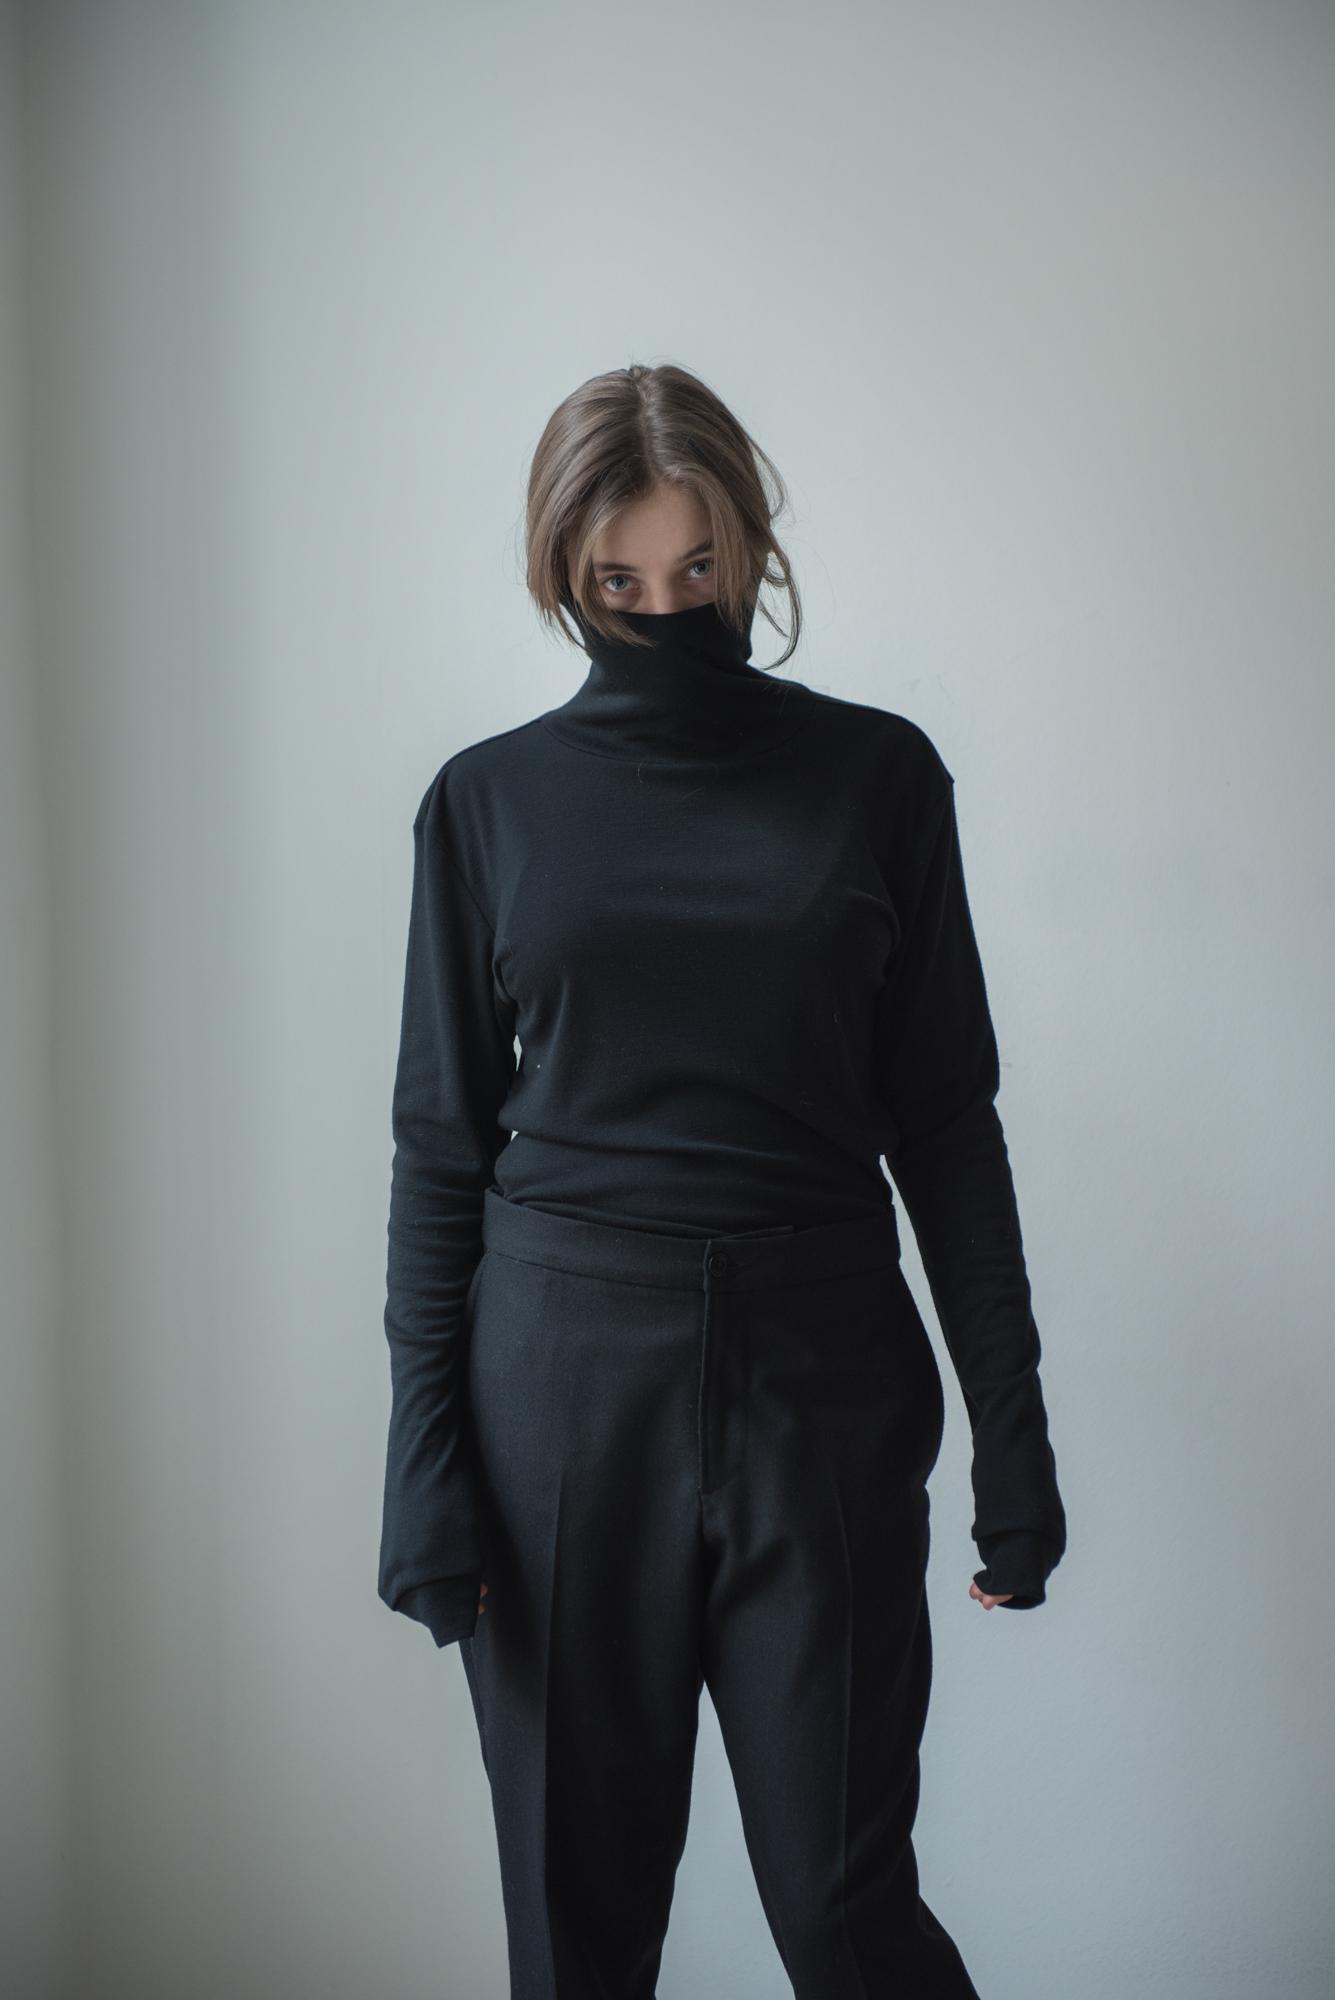 20180320_FashionWorkshop_Shoot0722_WEB_1.jpg